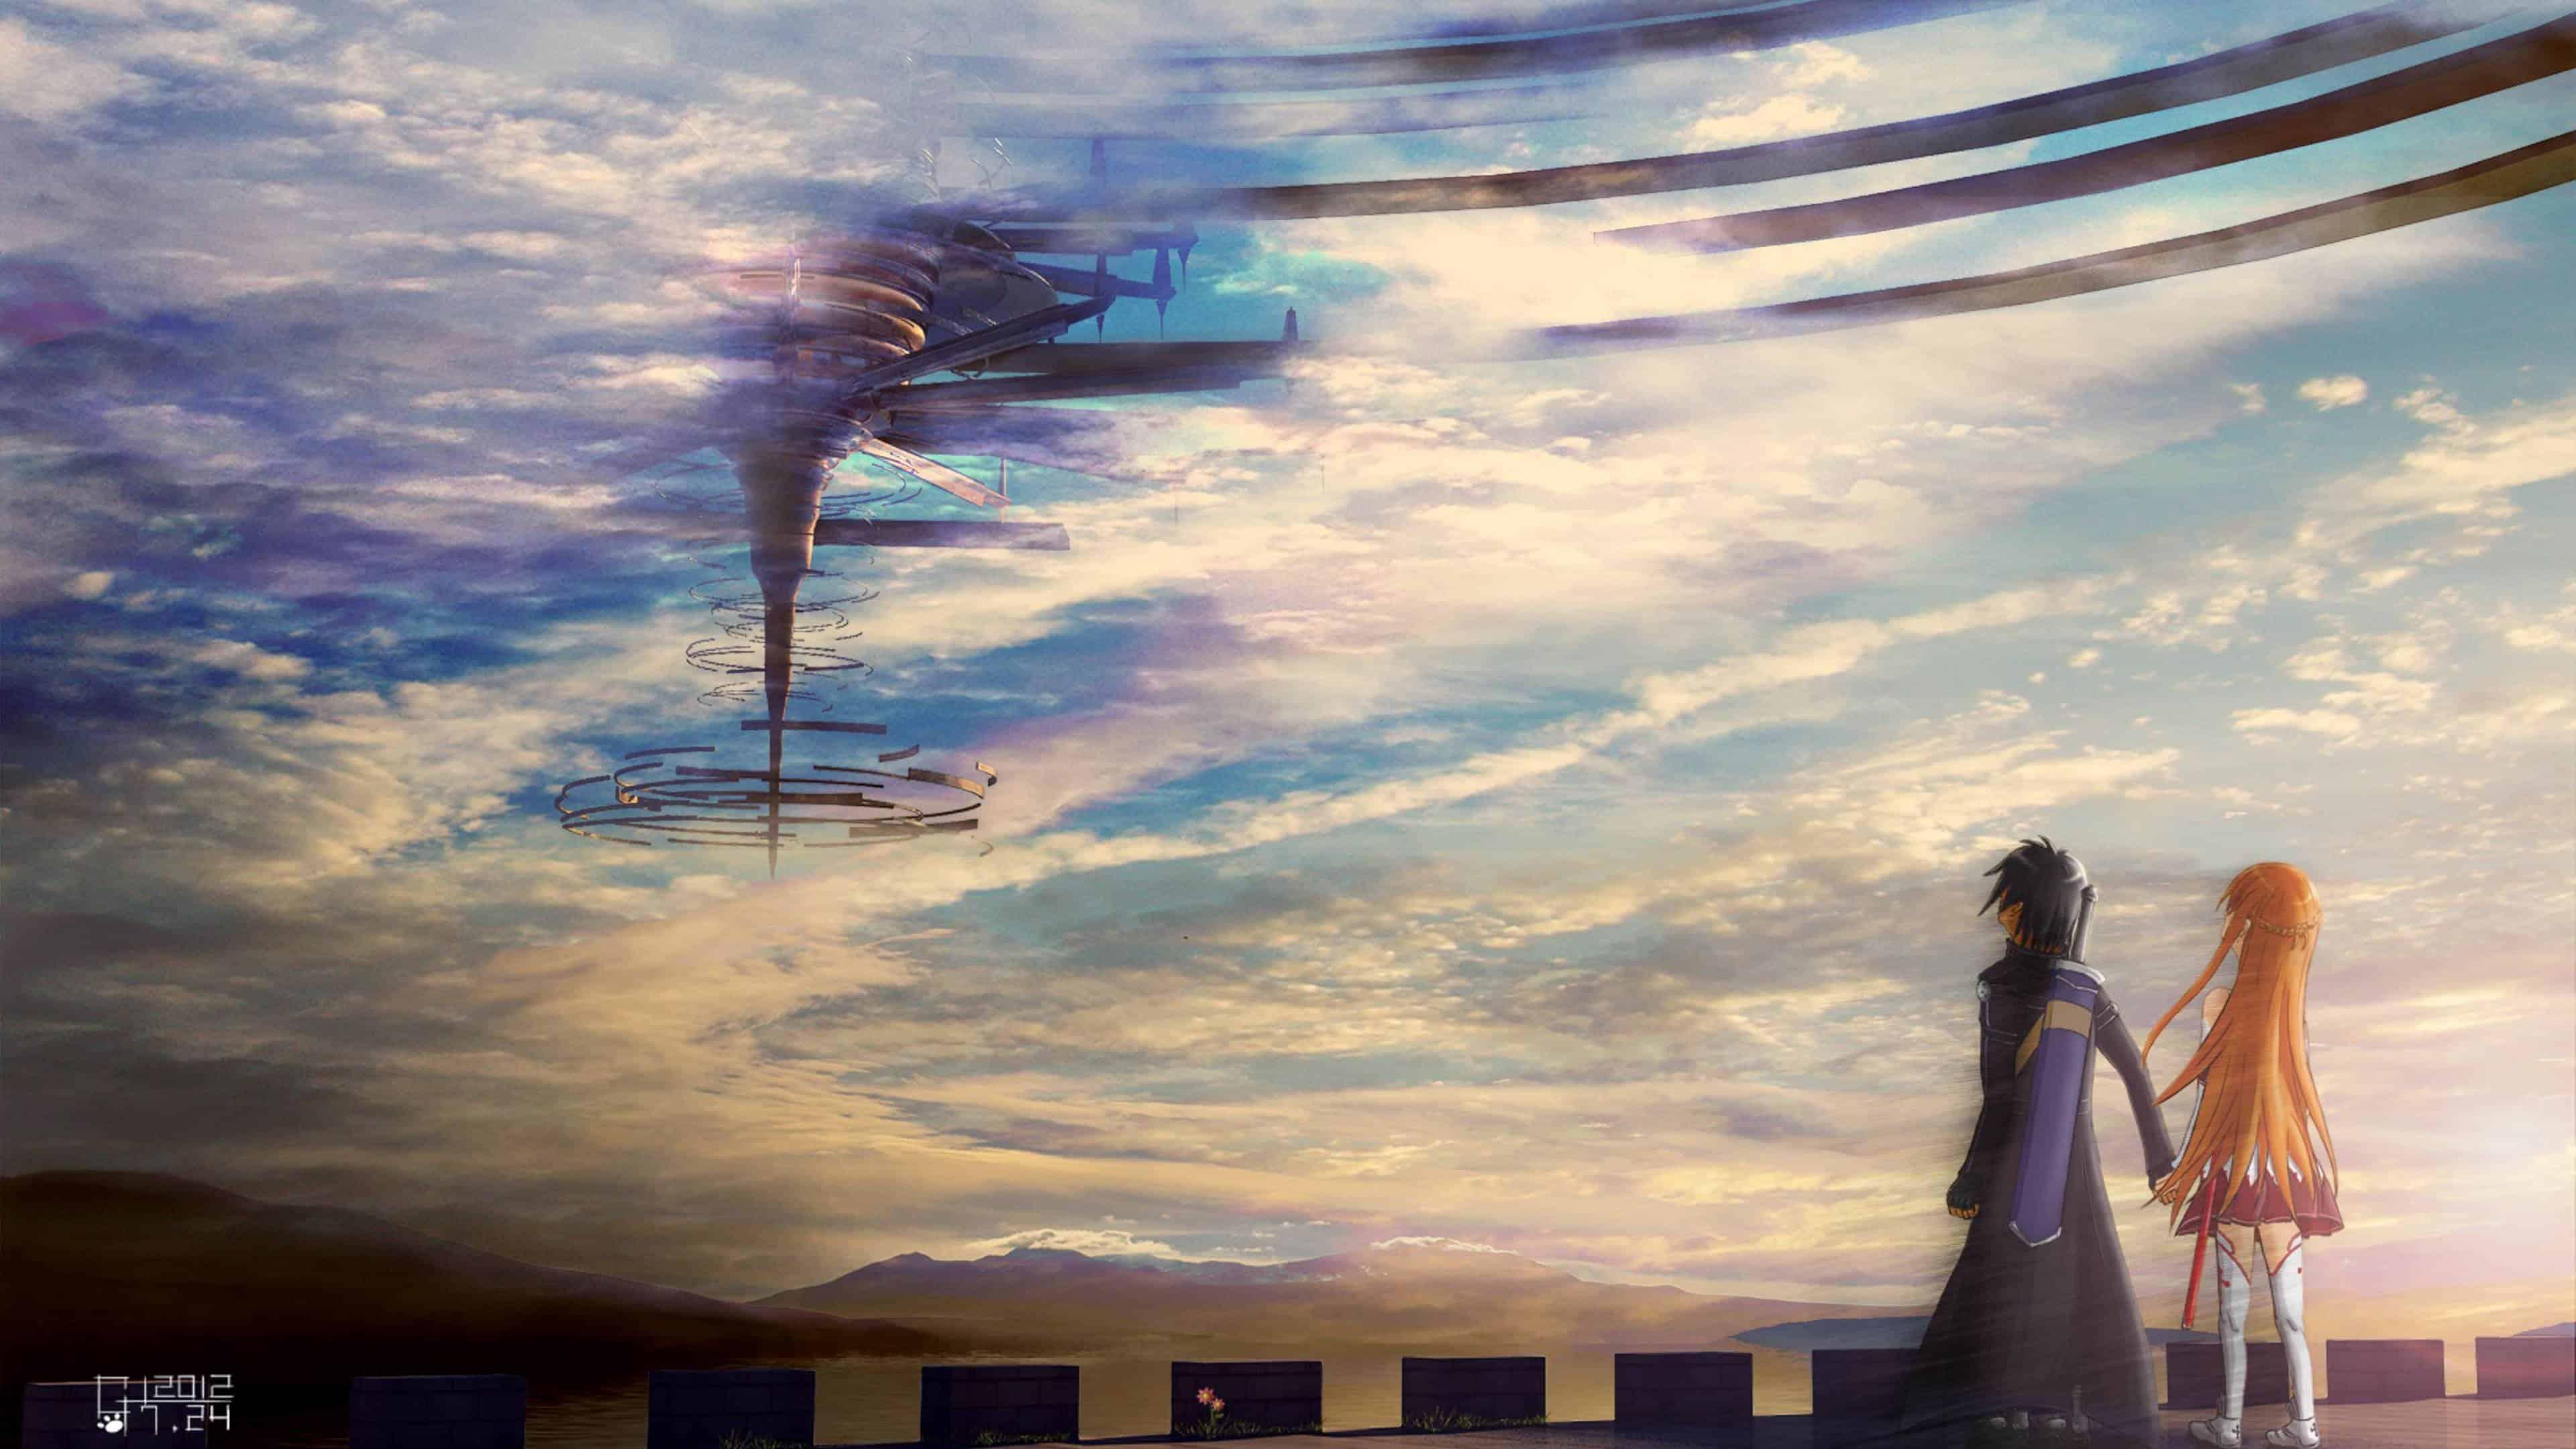 Cars Hd Mobile Wallpapers Sword Art Online Uhd 4k Wallpaper Pixelz